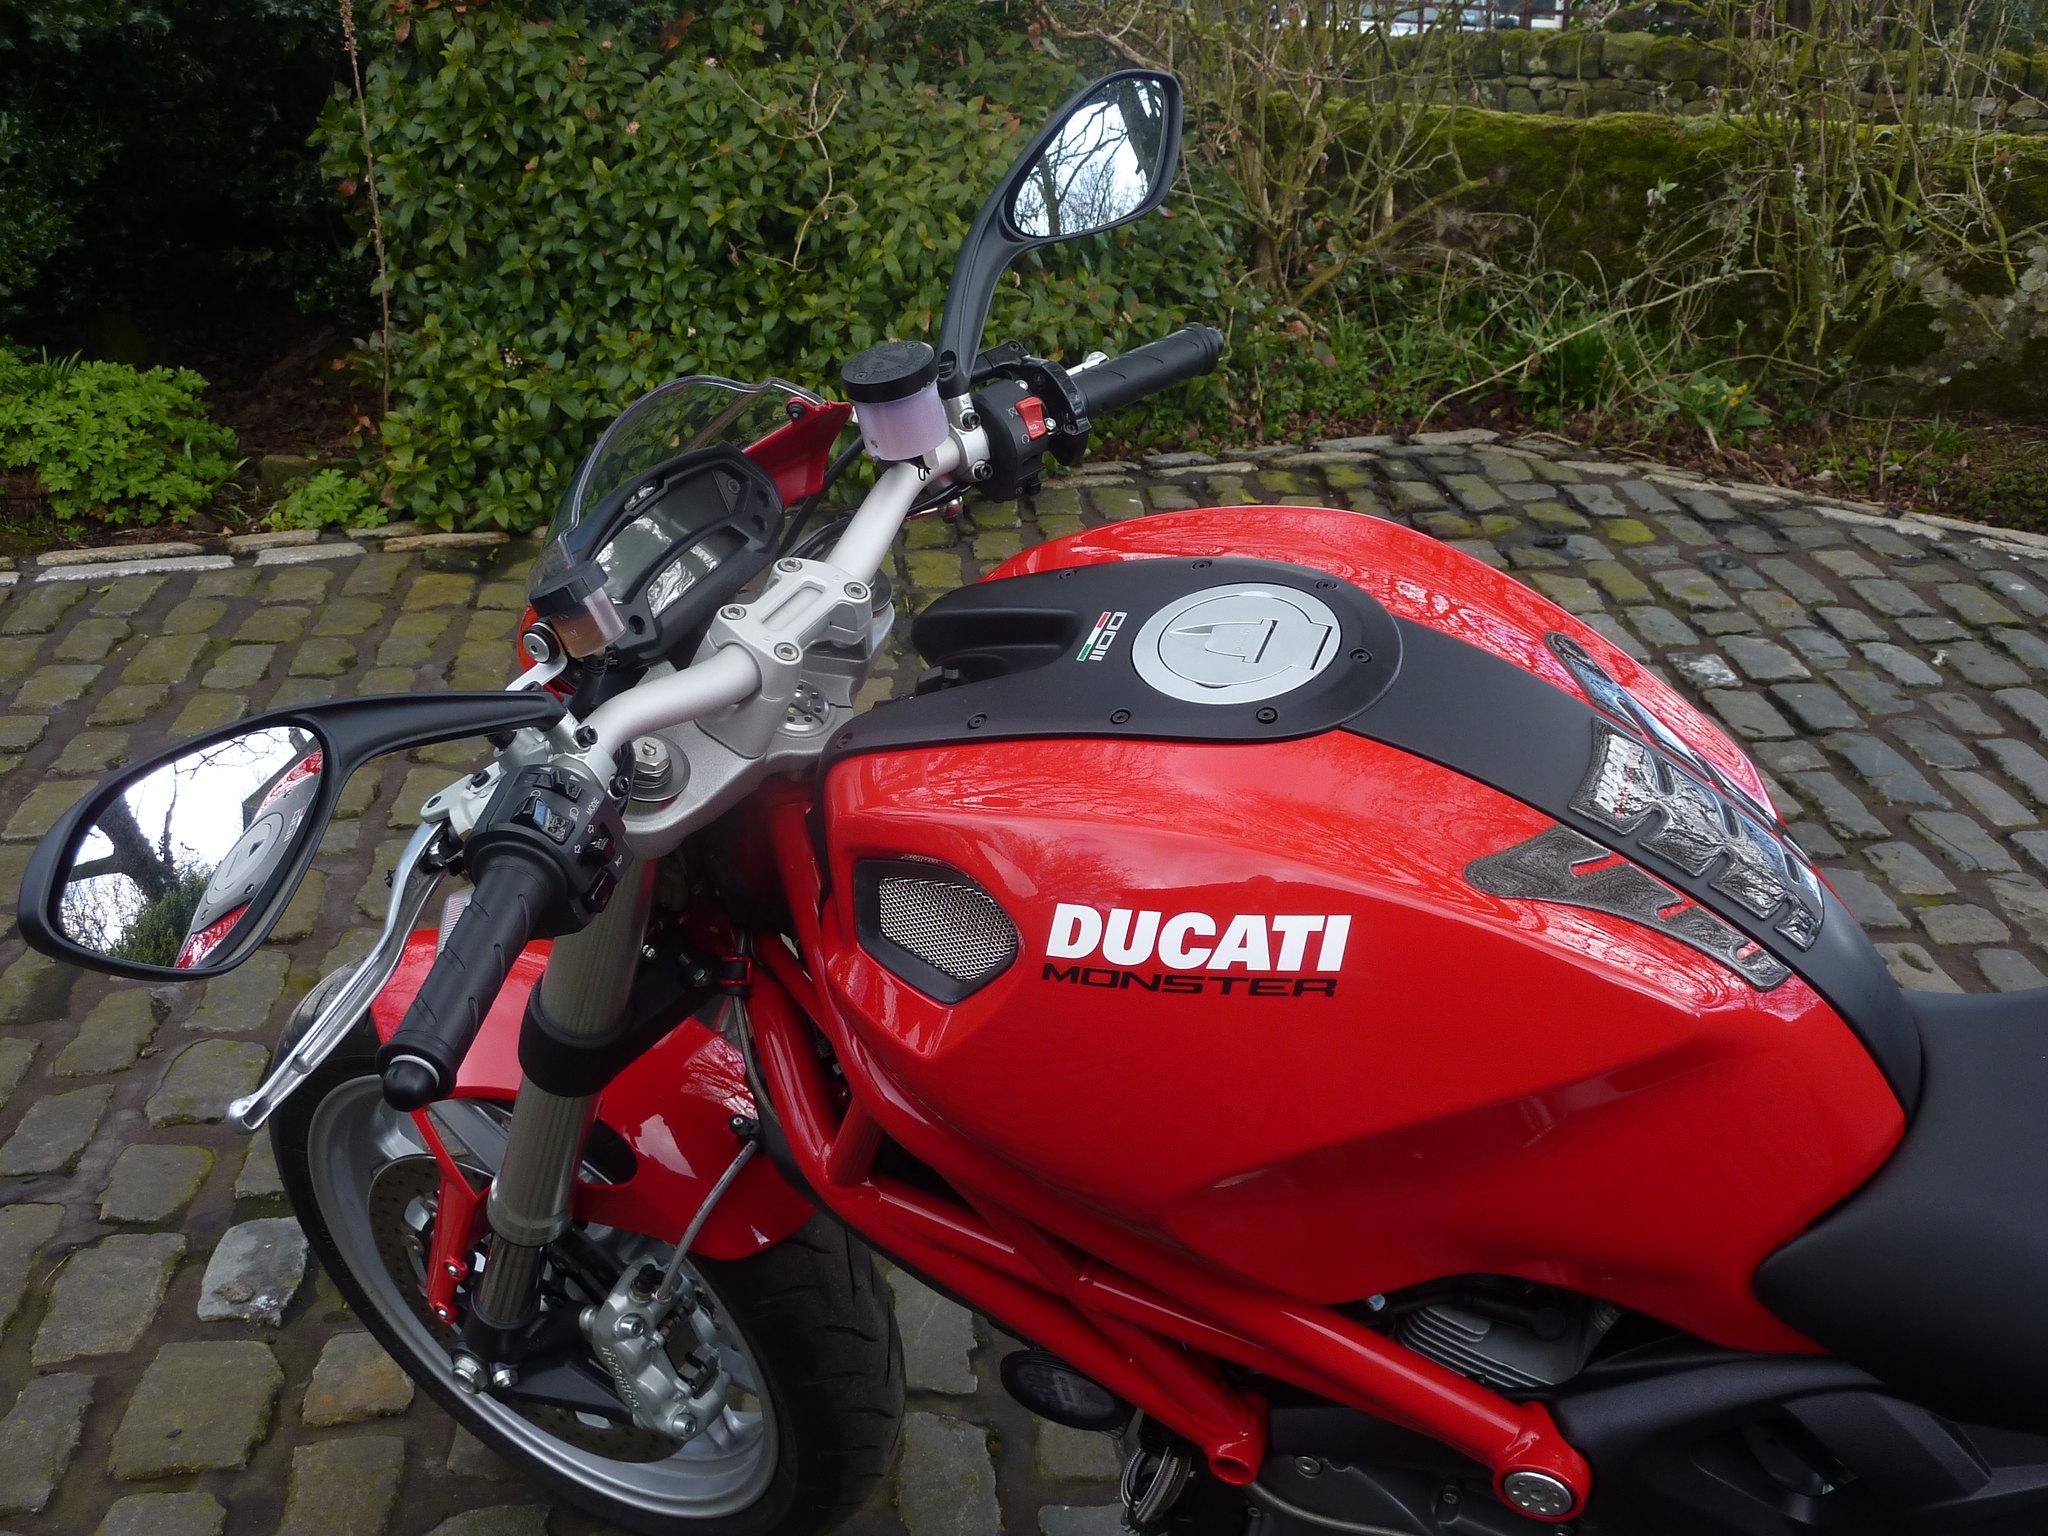 ducati-nadrz